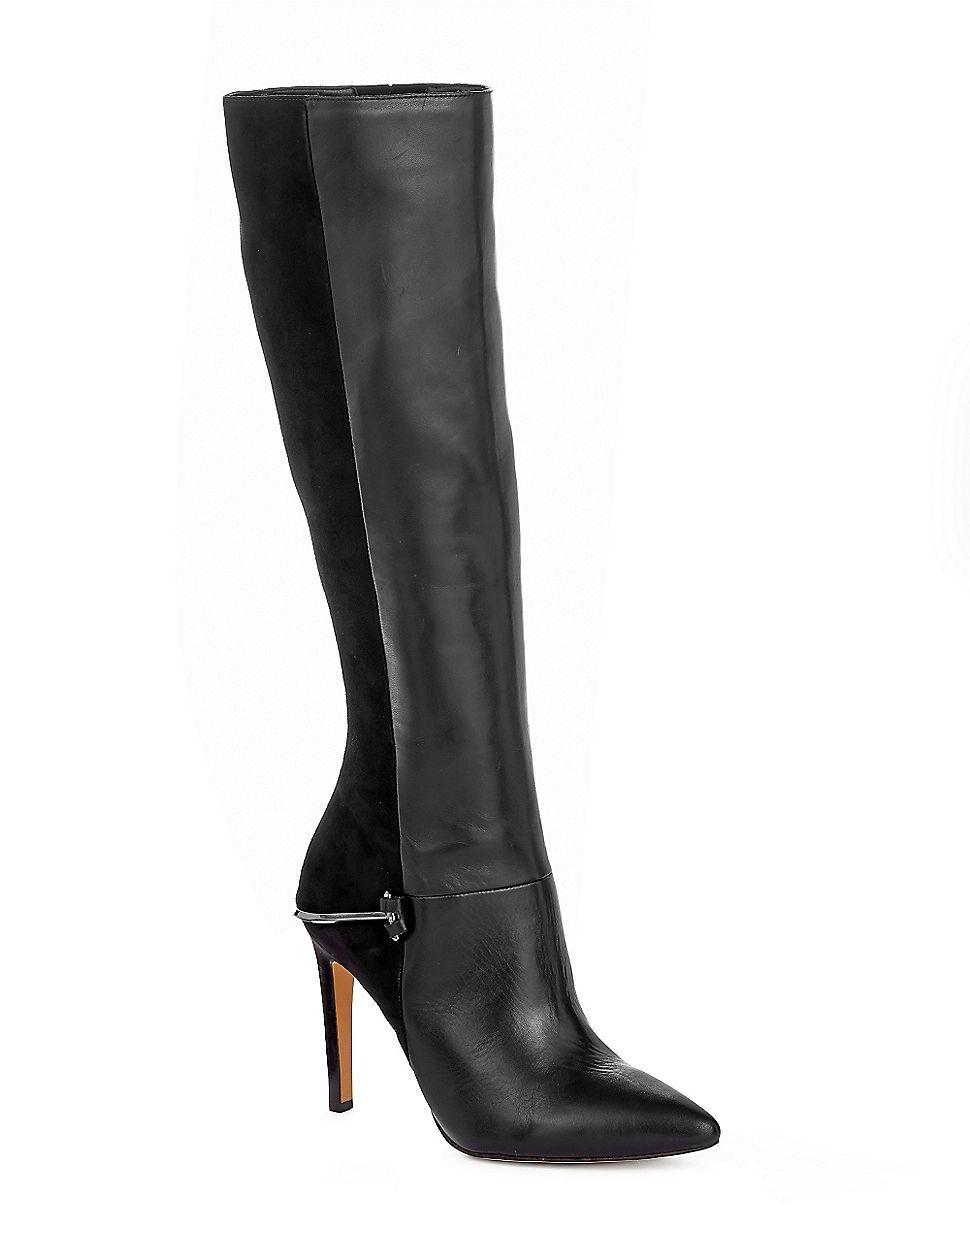 44262ad4c74 SAM EDELMAN Mazie Tall Boots